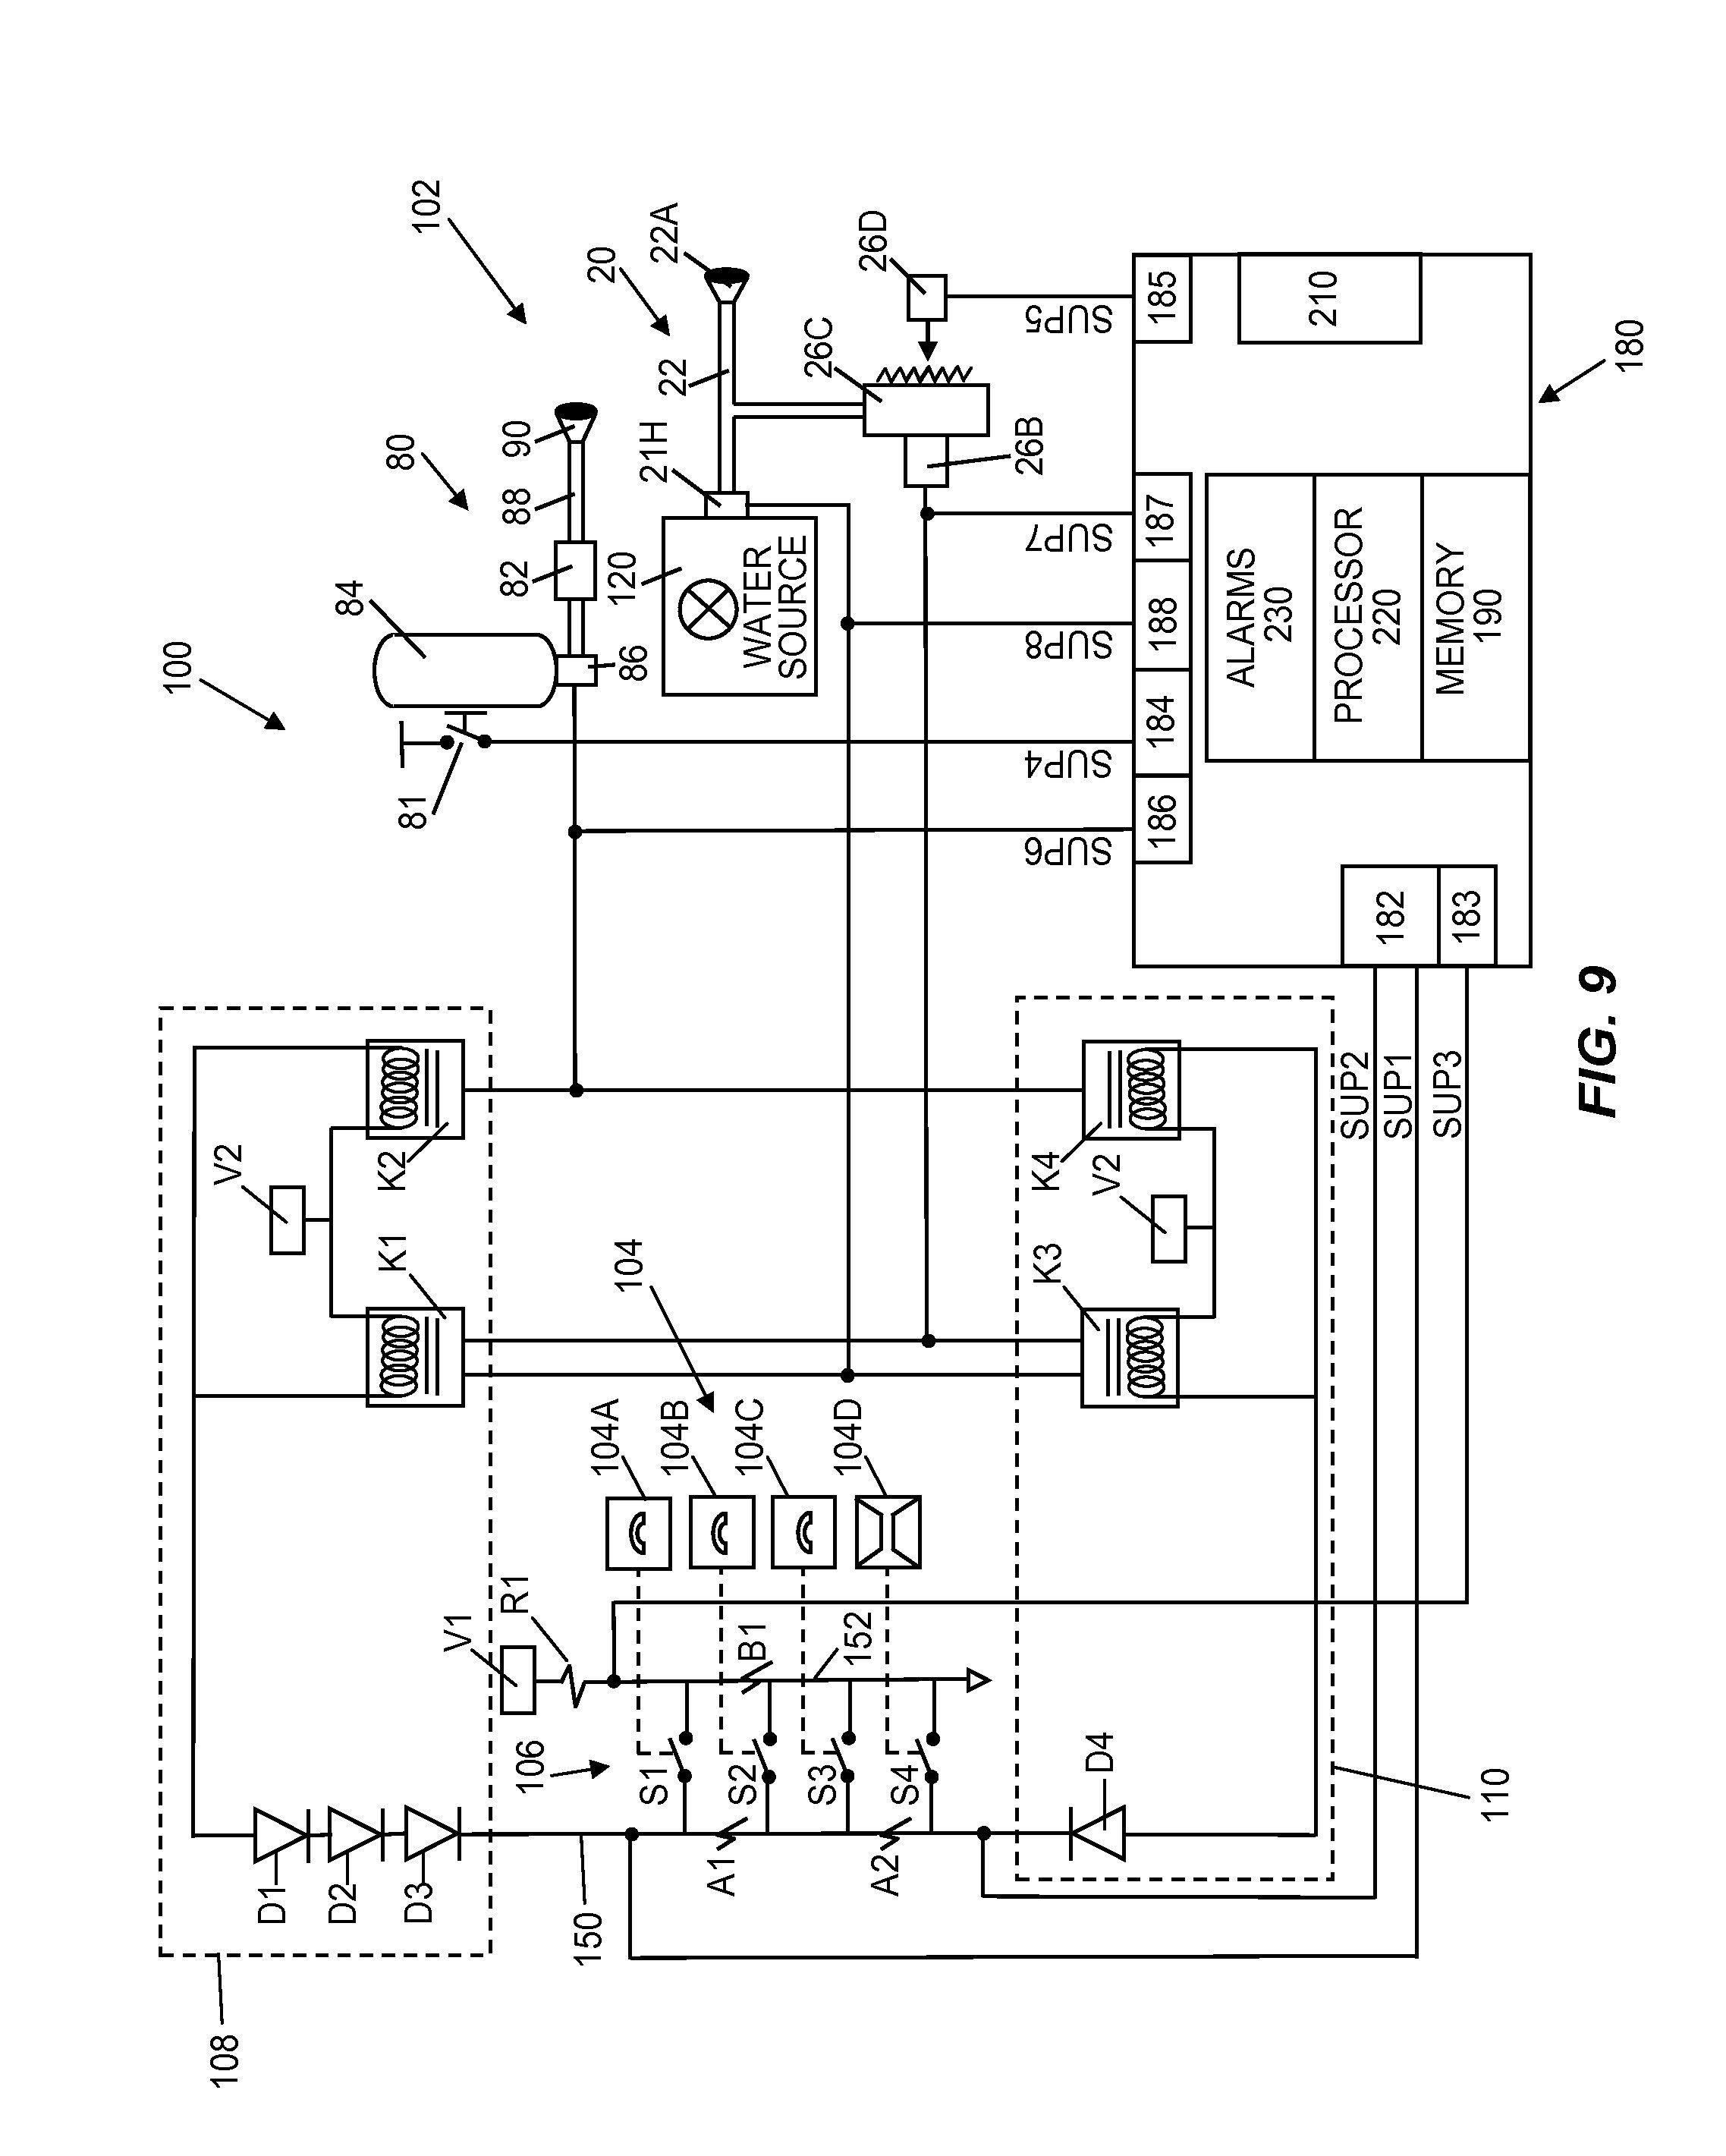 Unique Free Electrical Diagram Sample Diagram Wiringdiagram Diagramming Diagramm Visuals Visualisation Graphical Electrical Diagram Ansul System Diagram